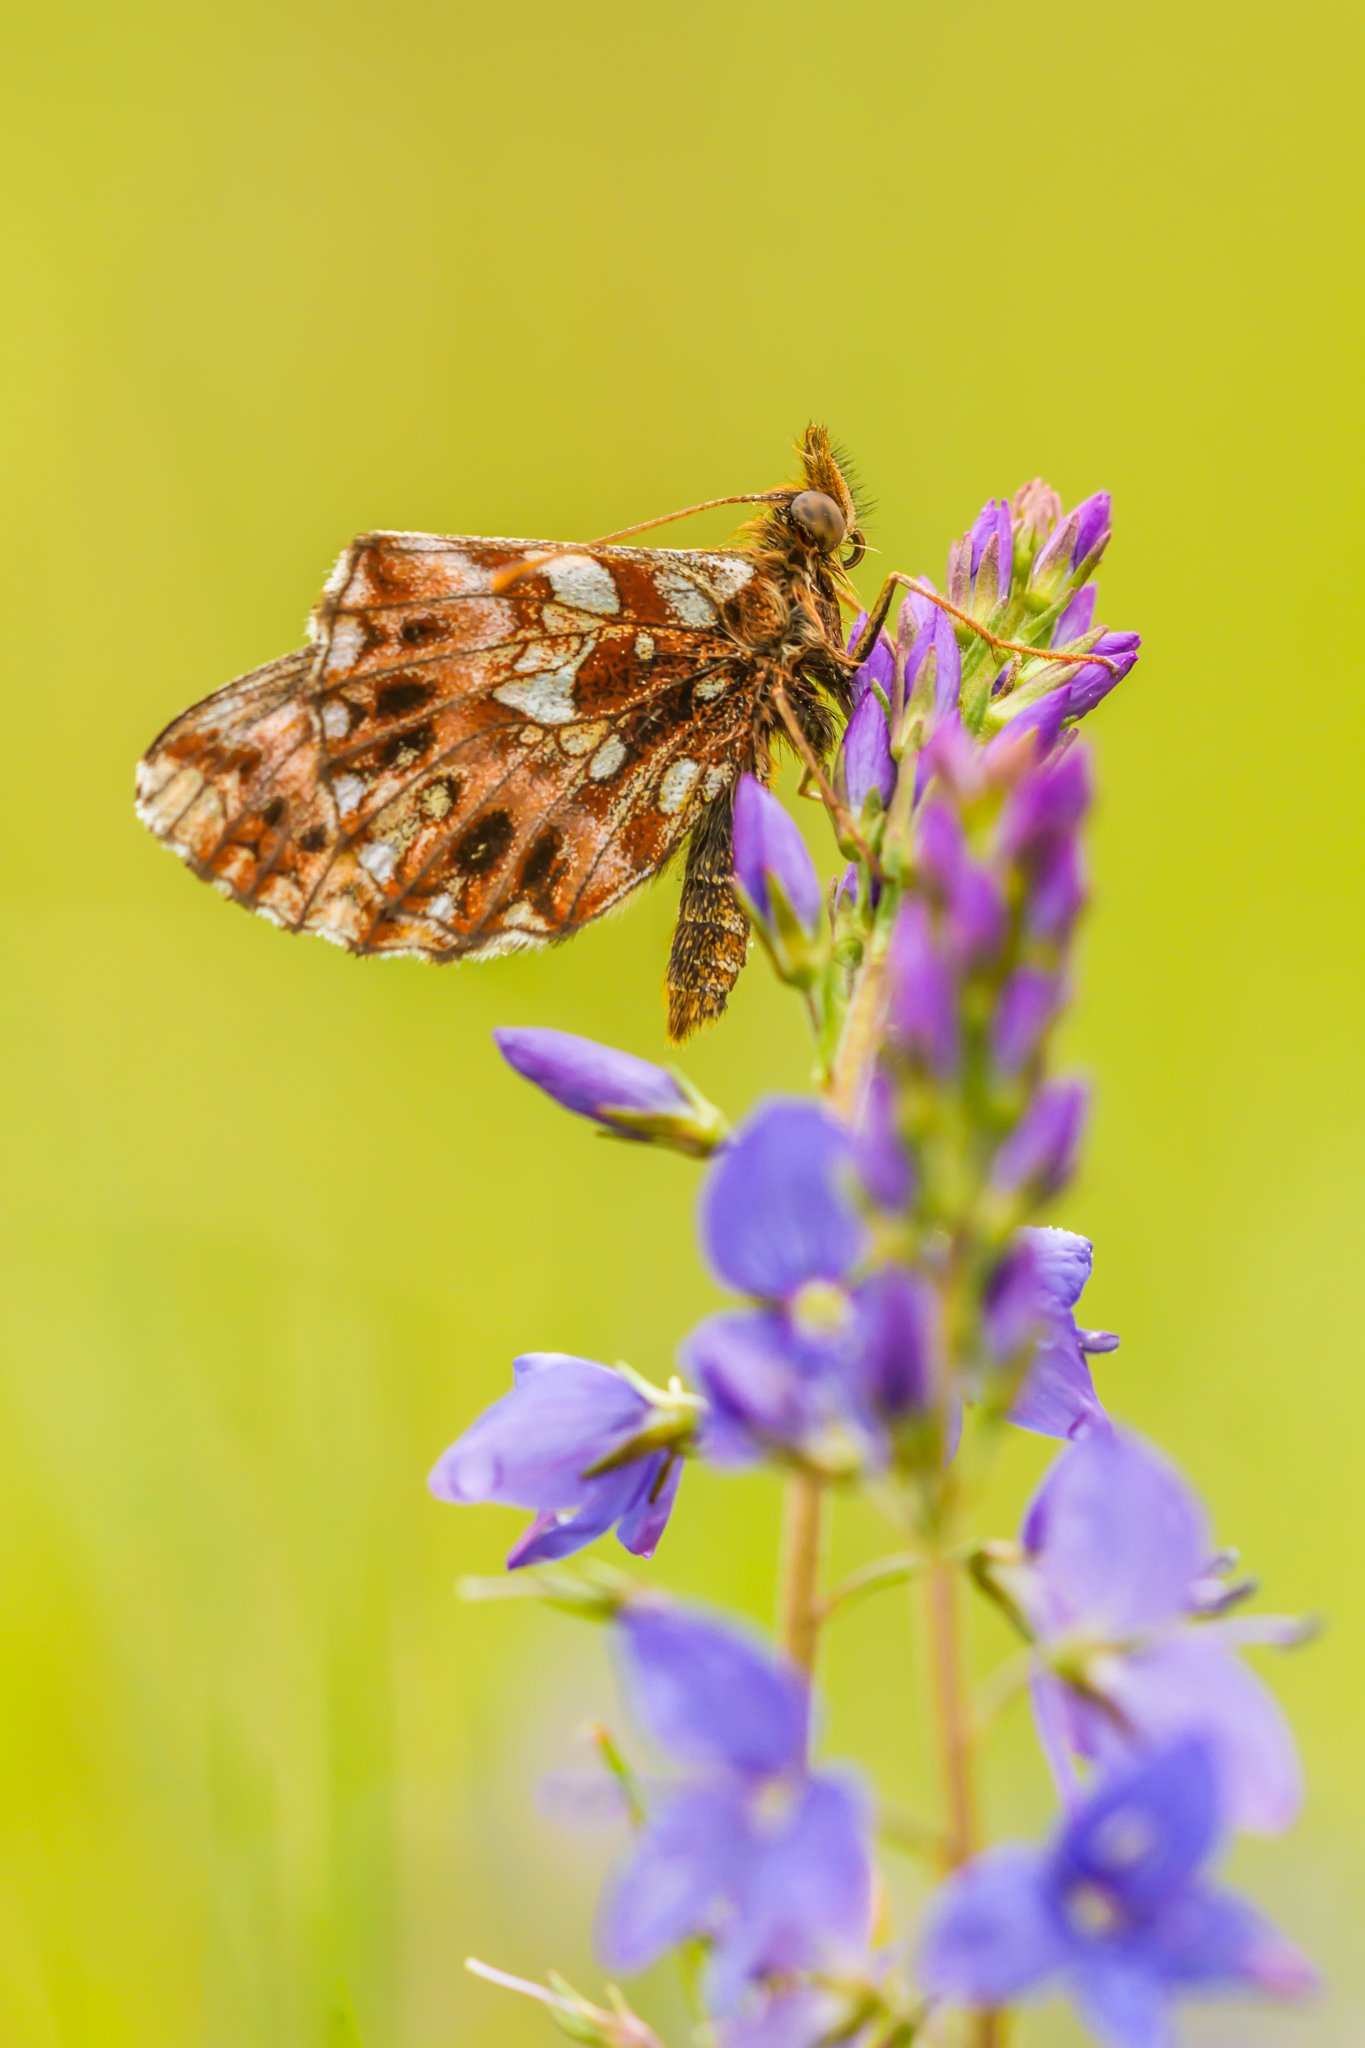 Paarse parelmoervlinder, Leo Deknatel, Vlinders fotograferen, Vlinderfotografie